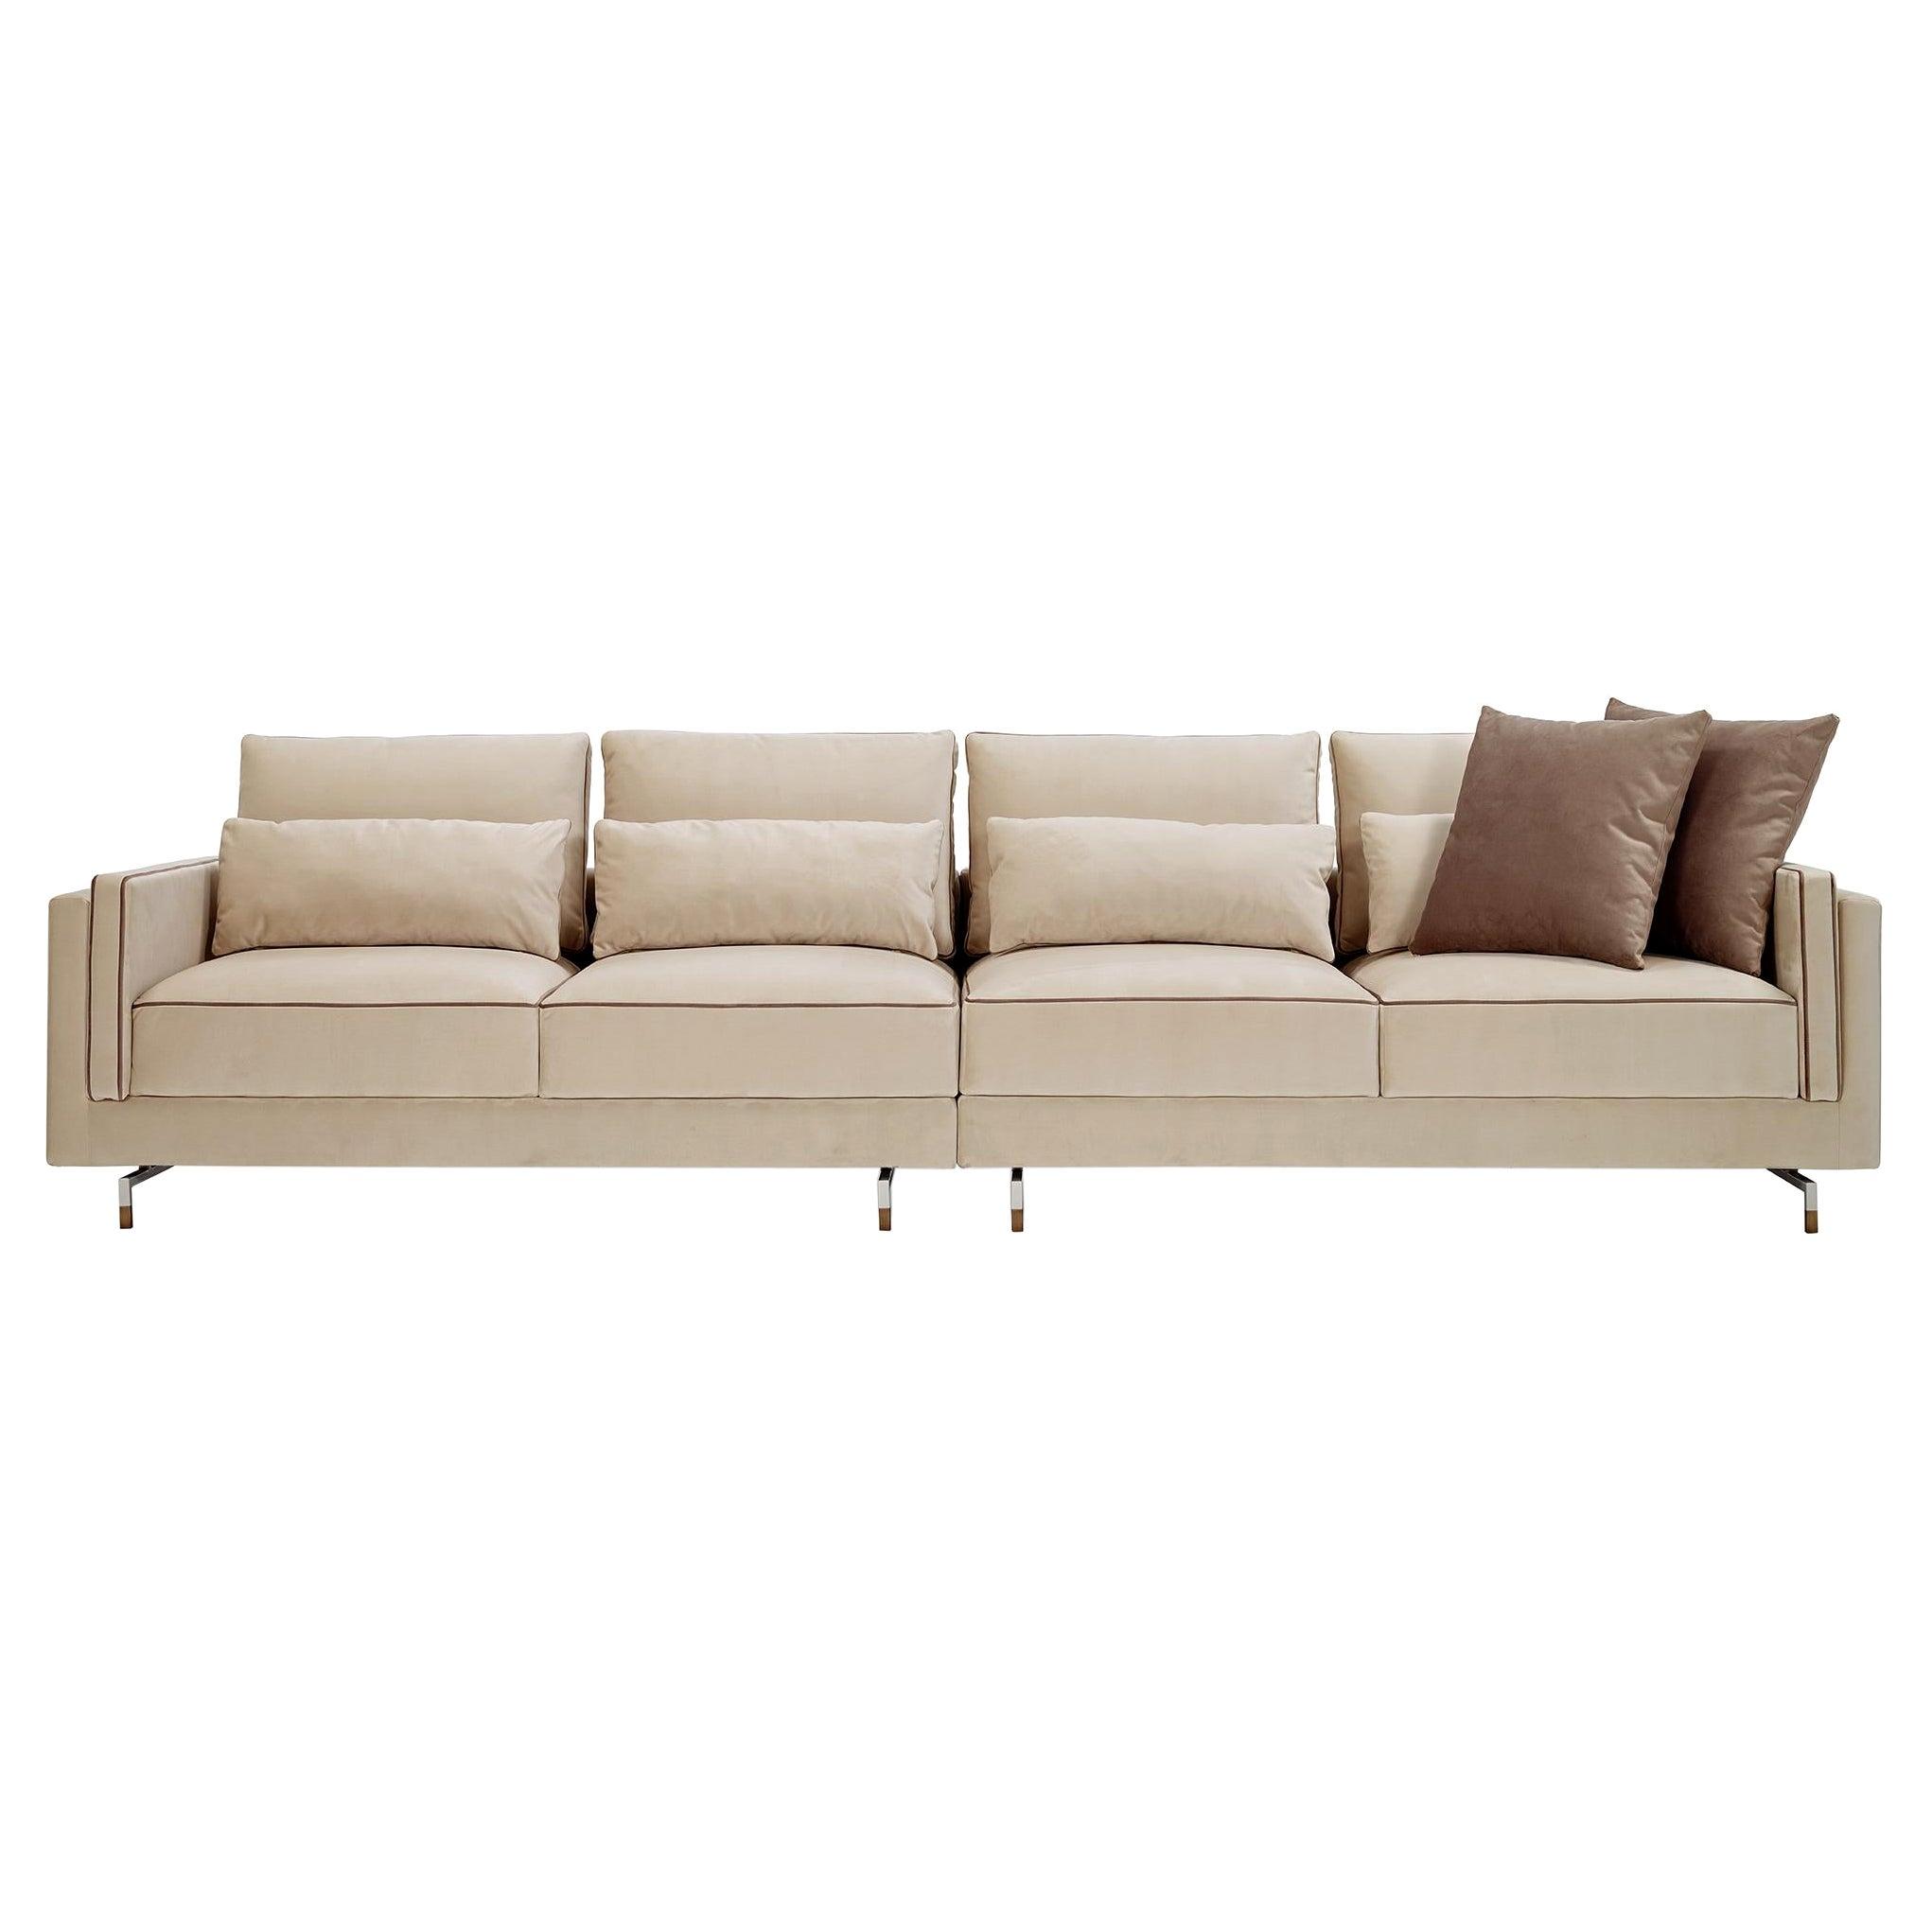 Sinatra Modular Sofa